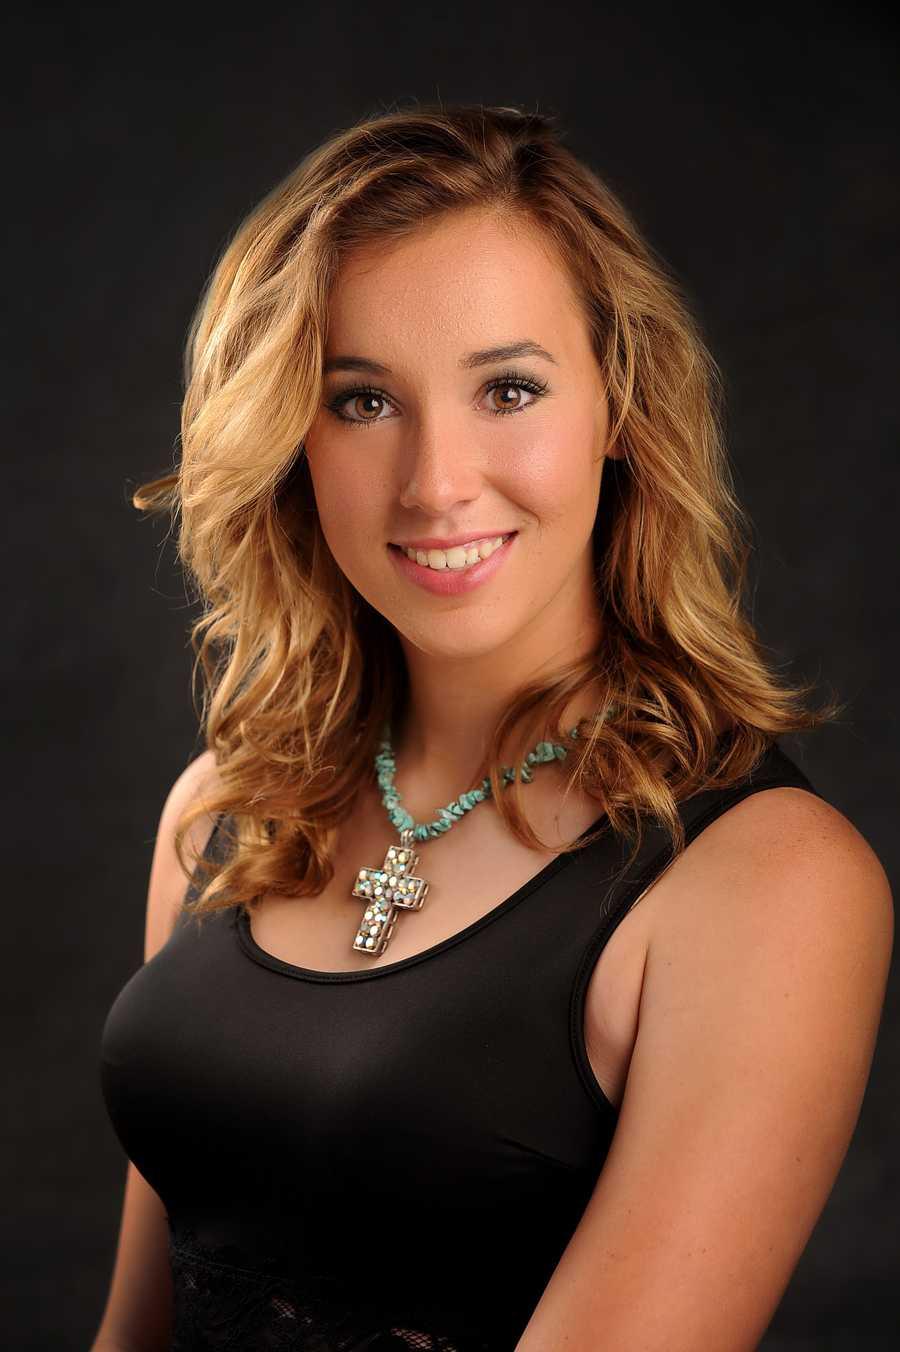 Danielle Peltier, Miss Dona Ana County